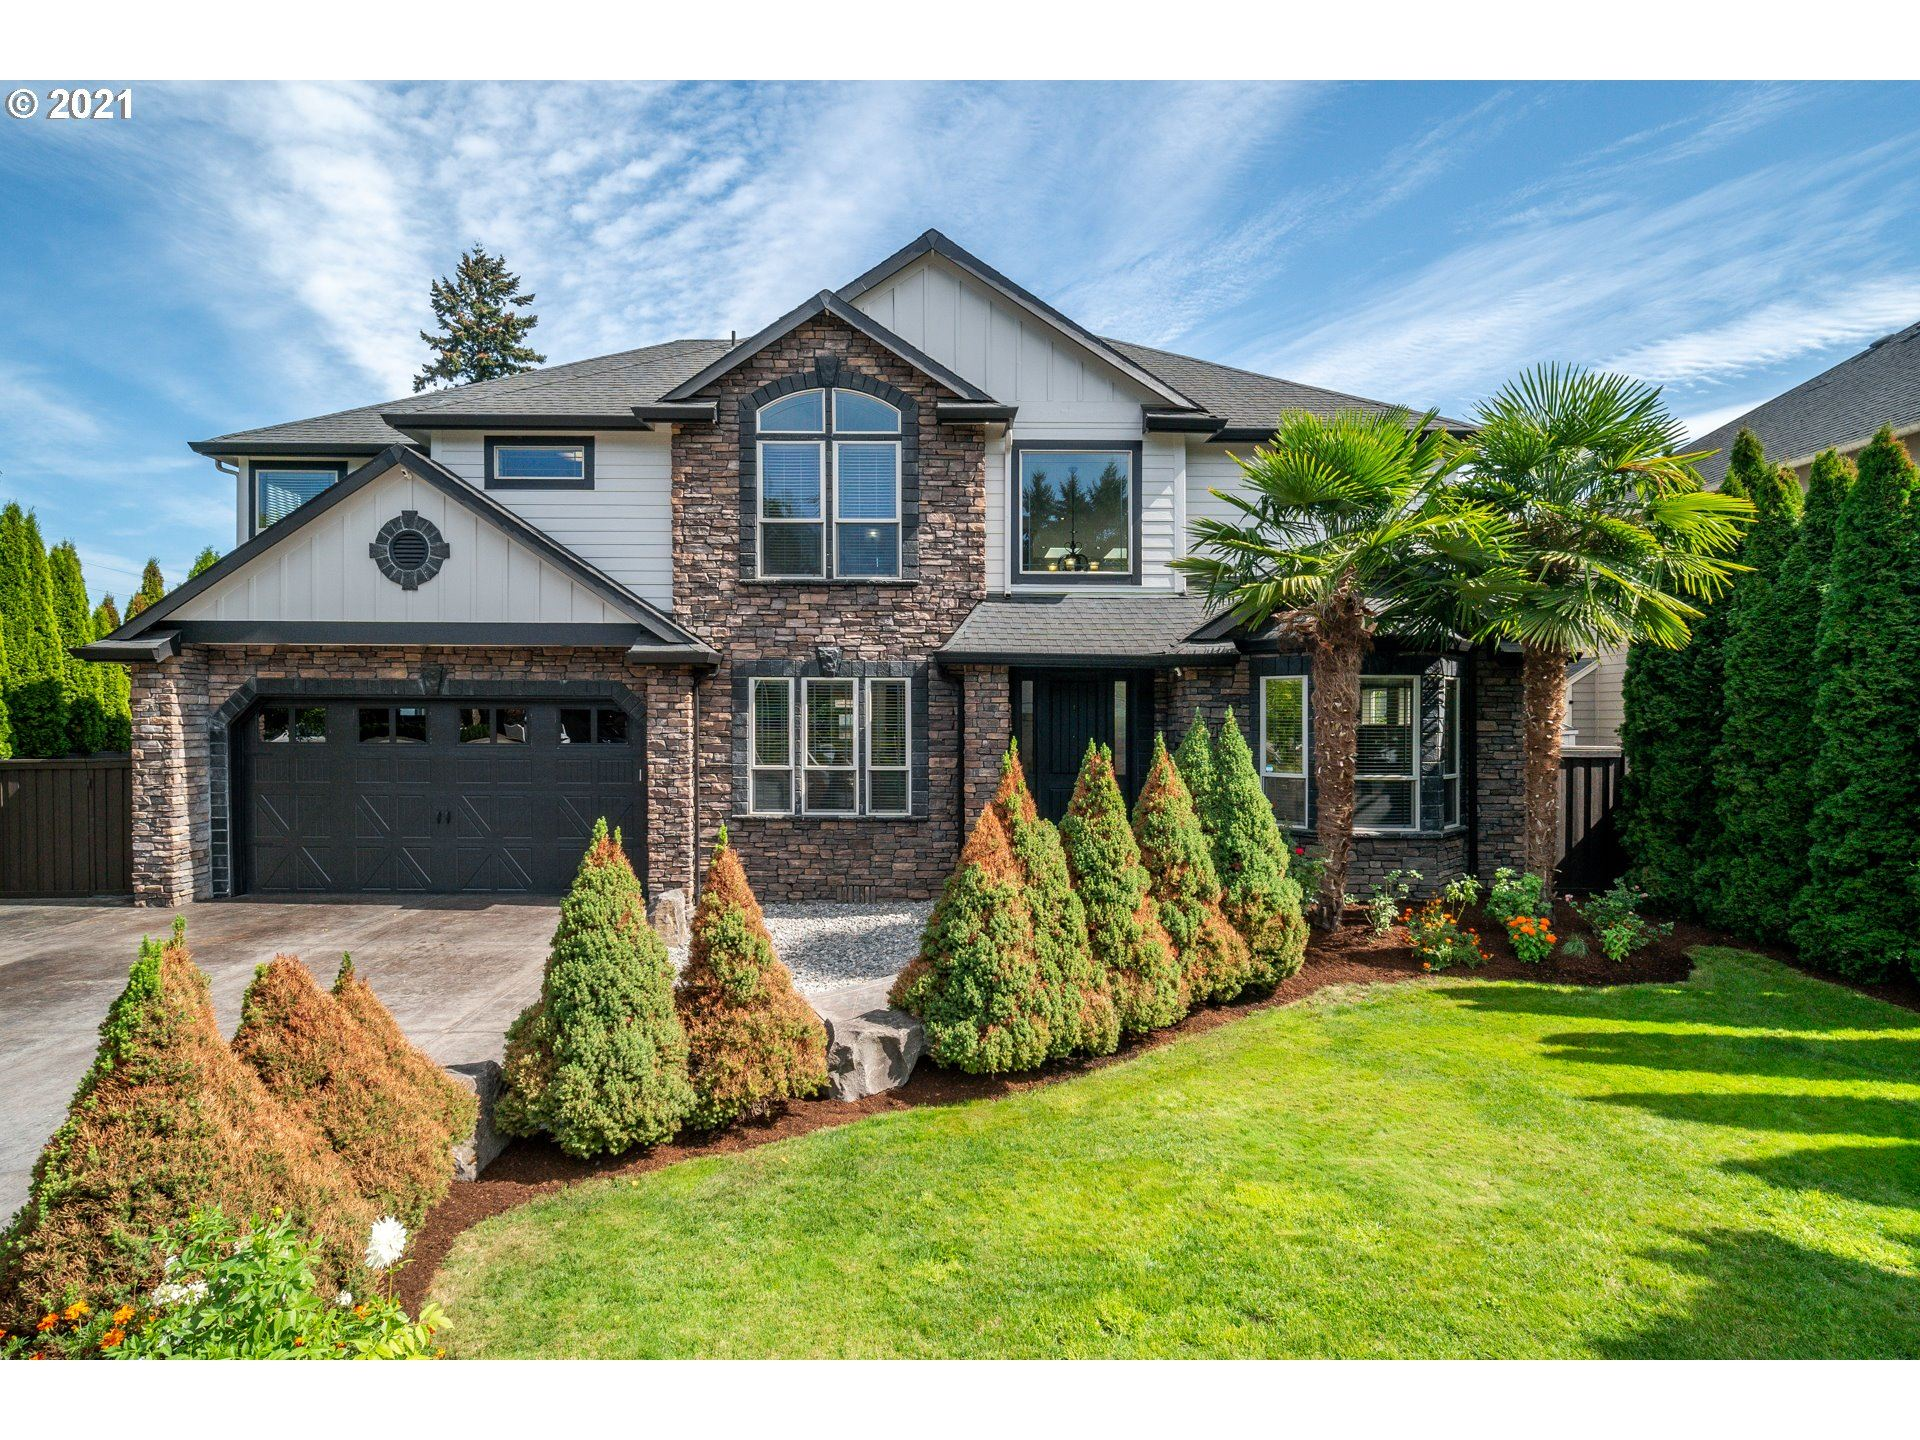 Vancouver, WA 98662